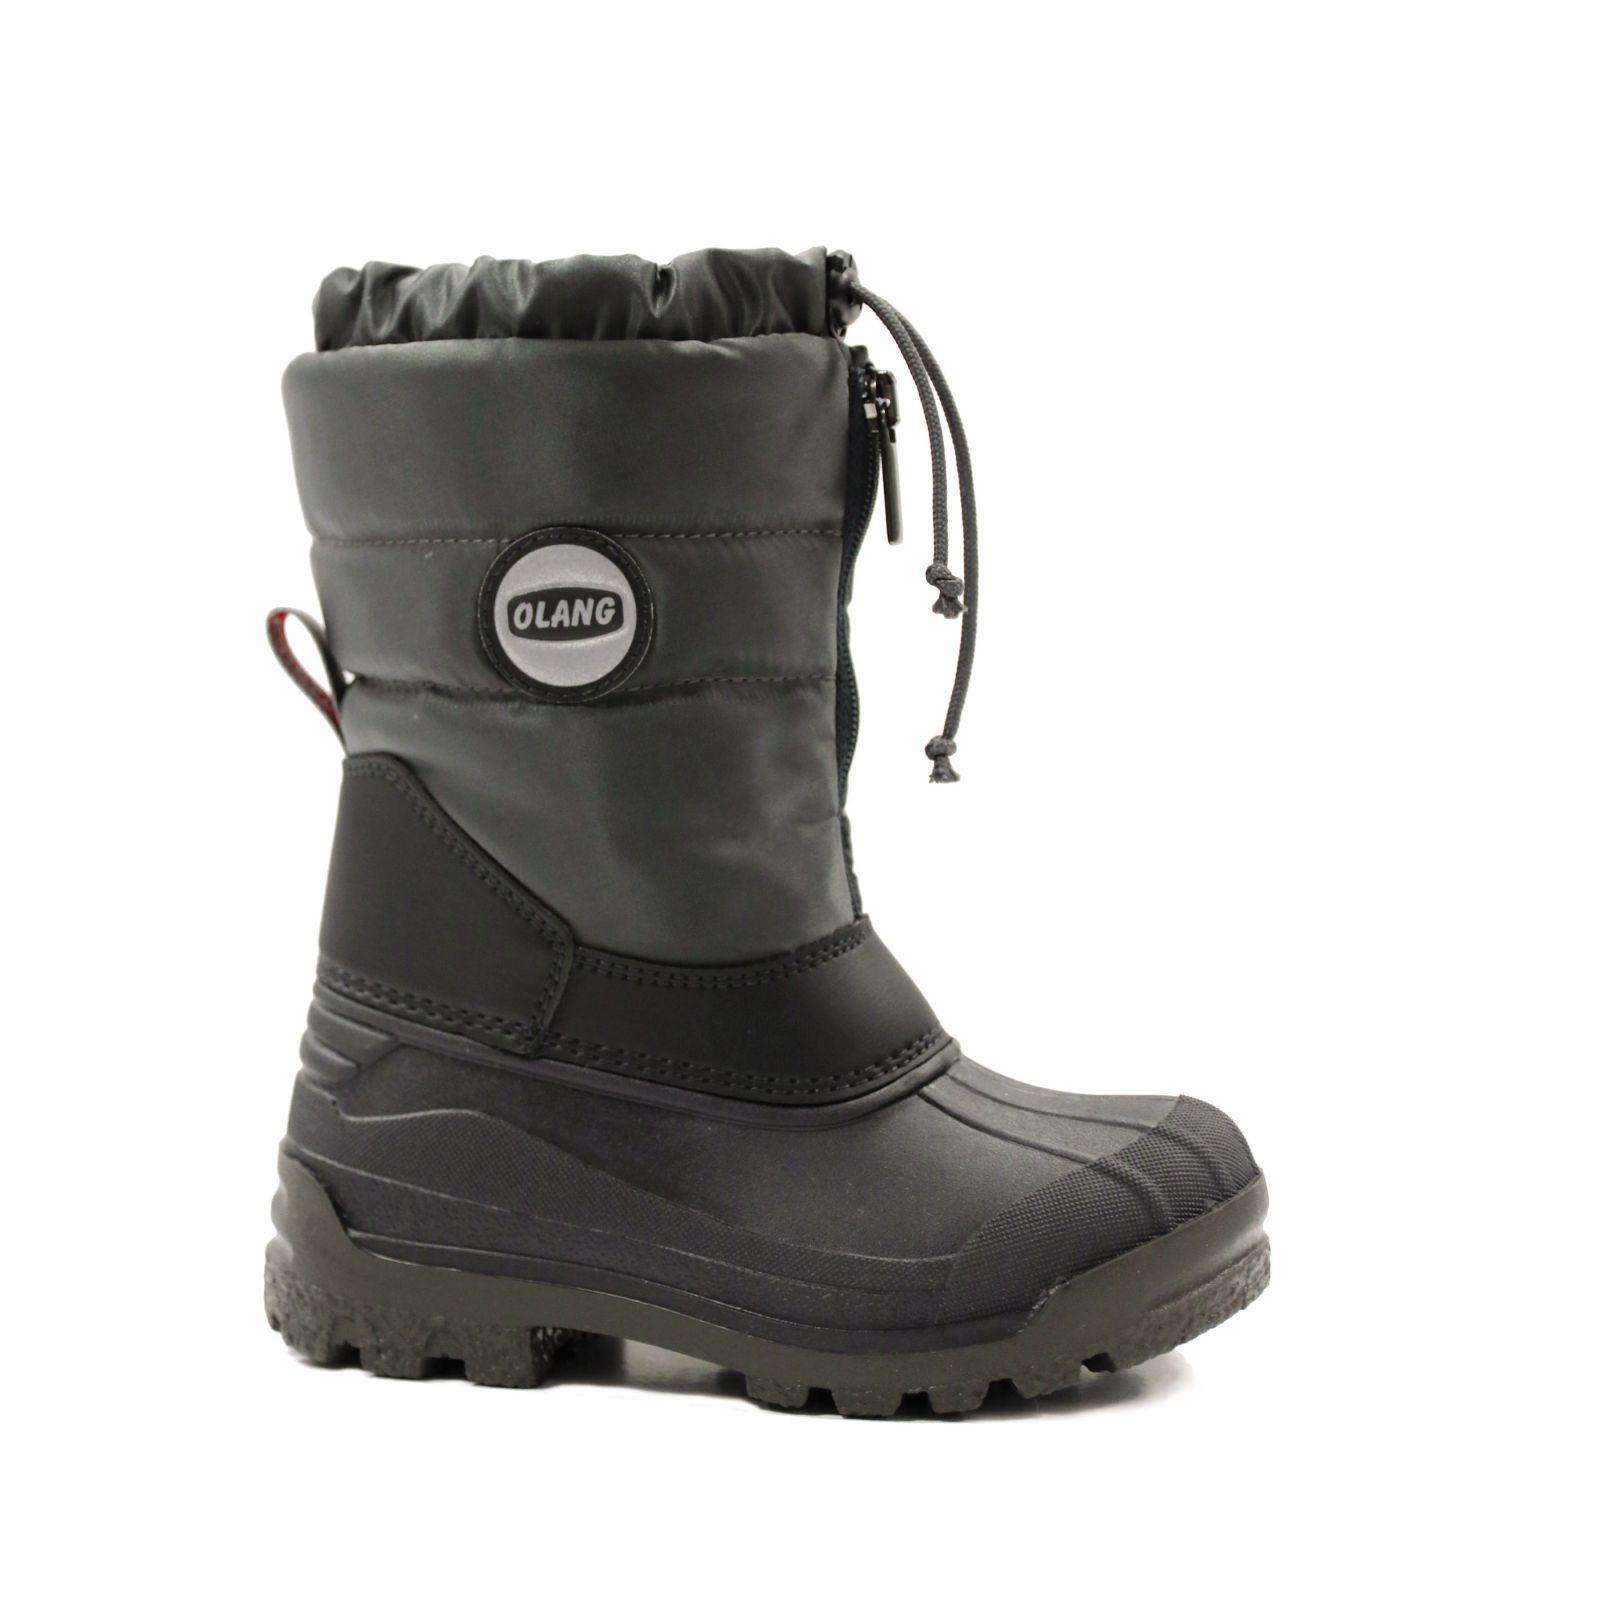 Tazz-Sport - Olang Volpe Antracite zimní obuv